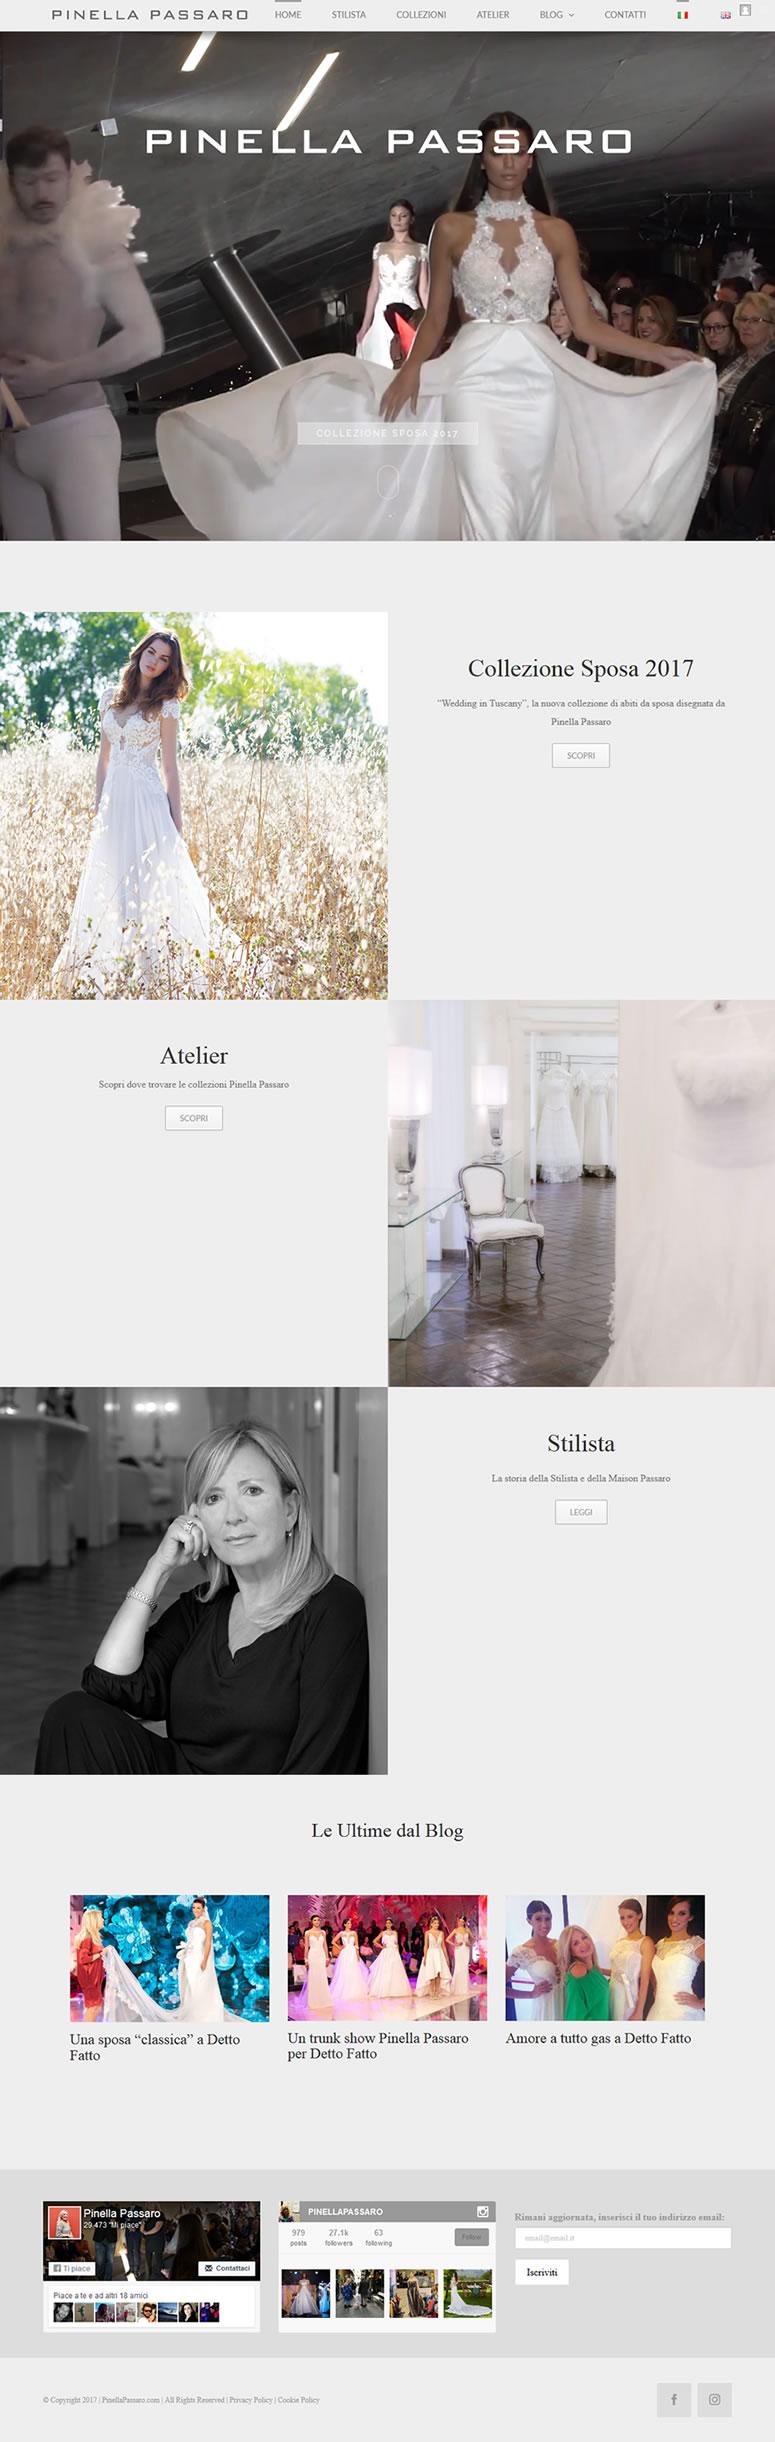 Pinella Passaro - Il wedding blog sul mondo sposa - www.SetteWeb.it